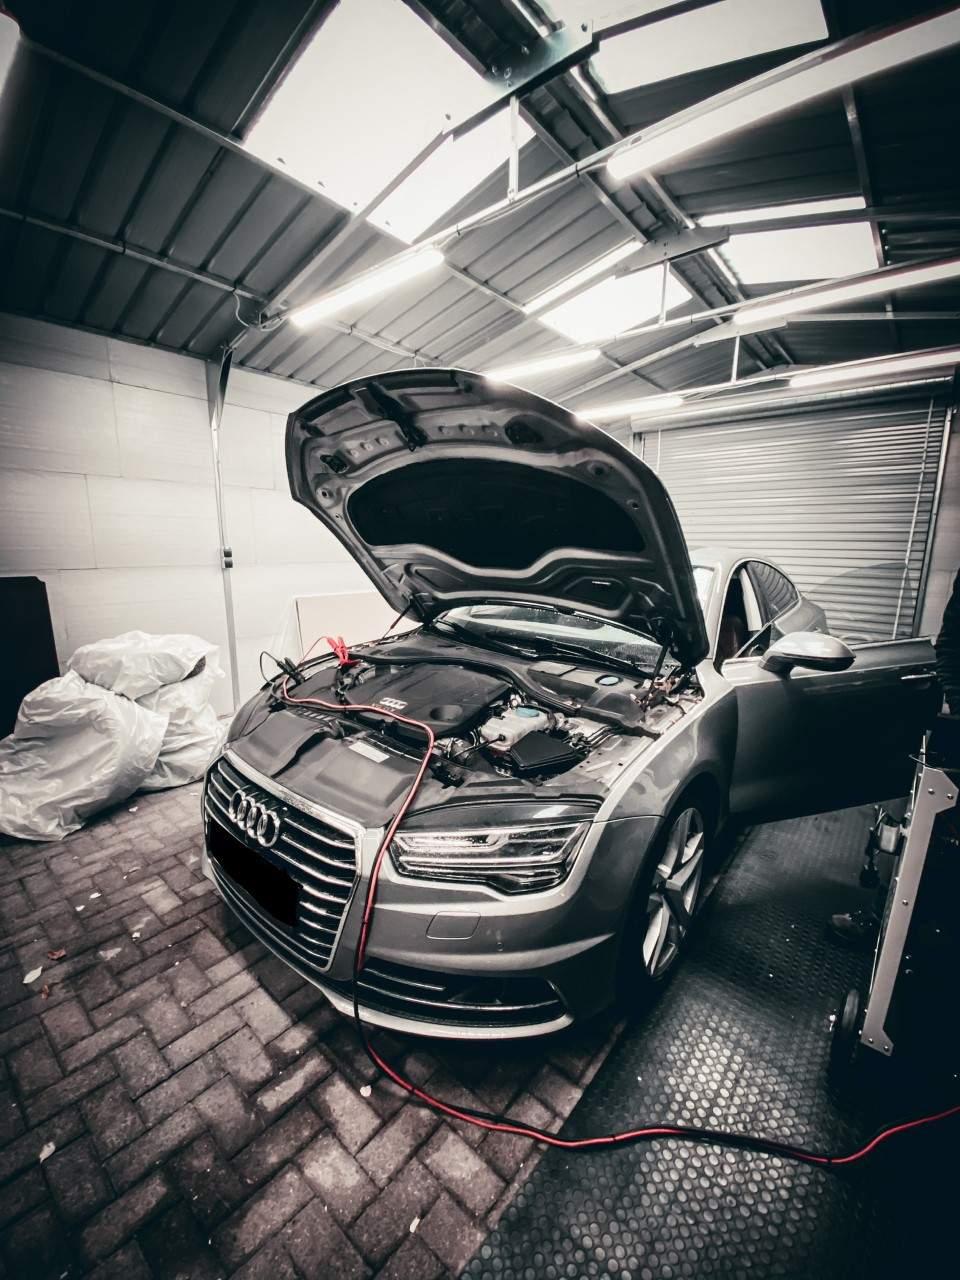 Stage 1 Optimierung Audi A7 3.0TDI